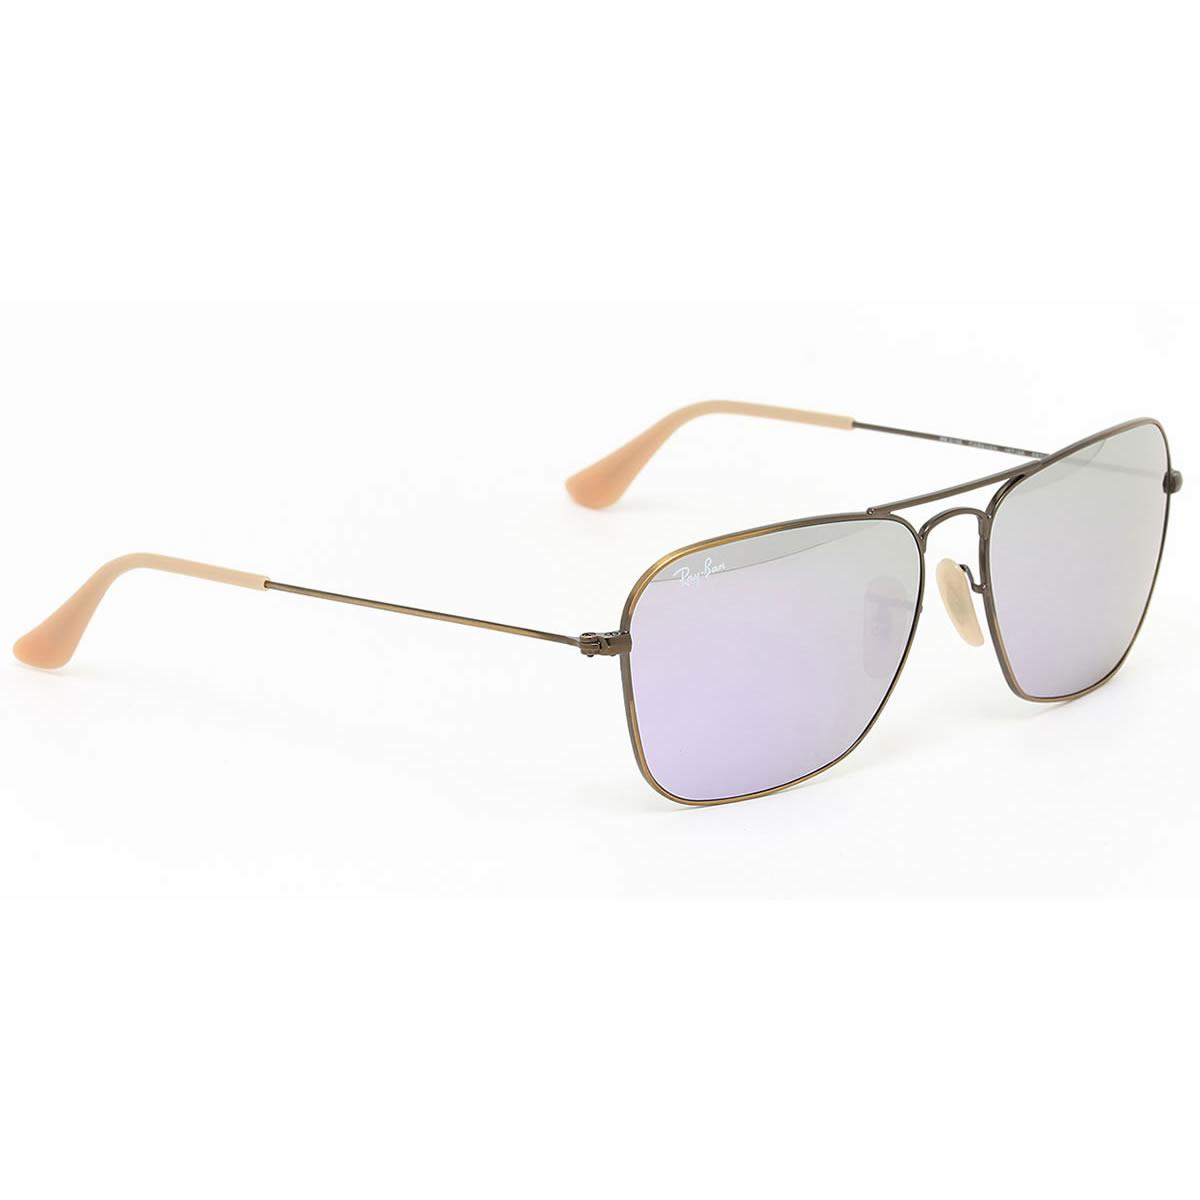 eaeefe49a2 Ray-Ban Sunglasses RB3136 167 4K 58size CARAVAN GENUINE NEW rayban ray ban